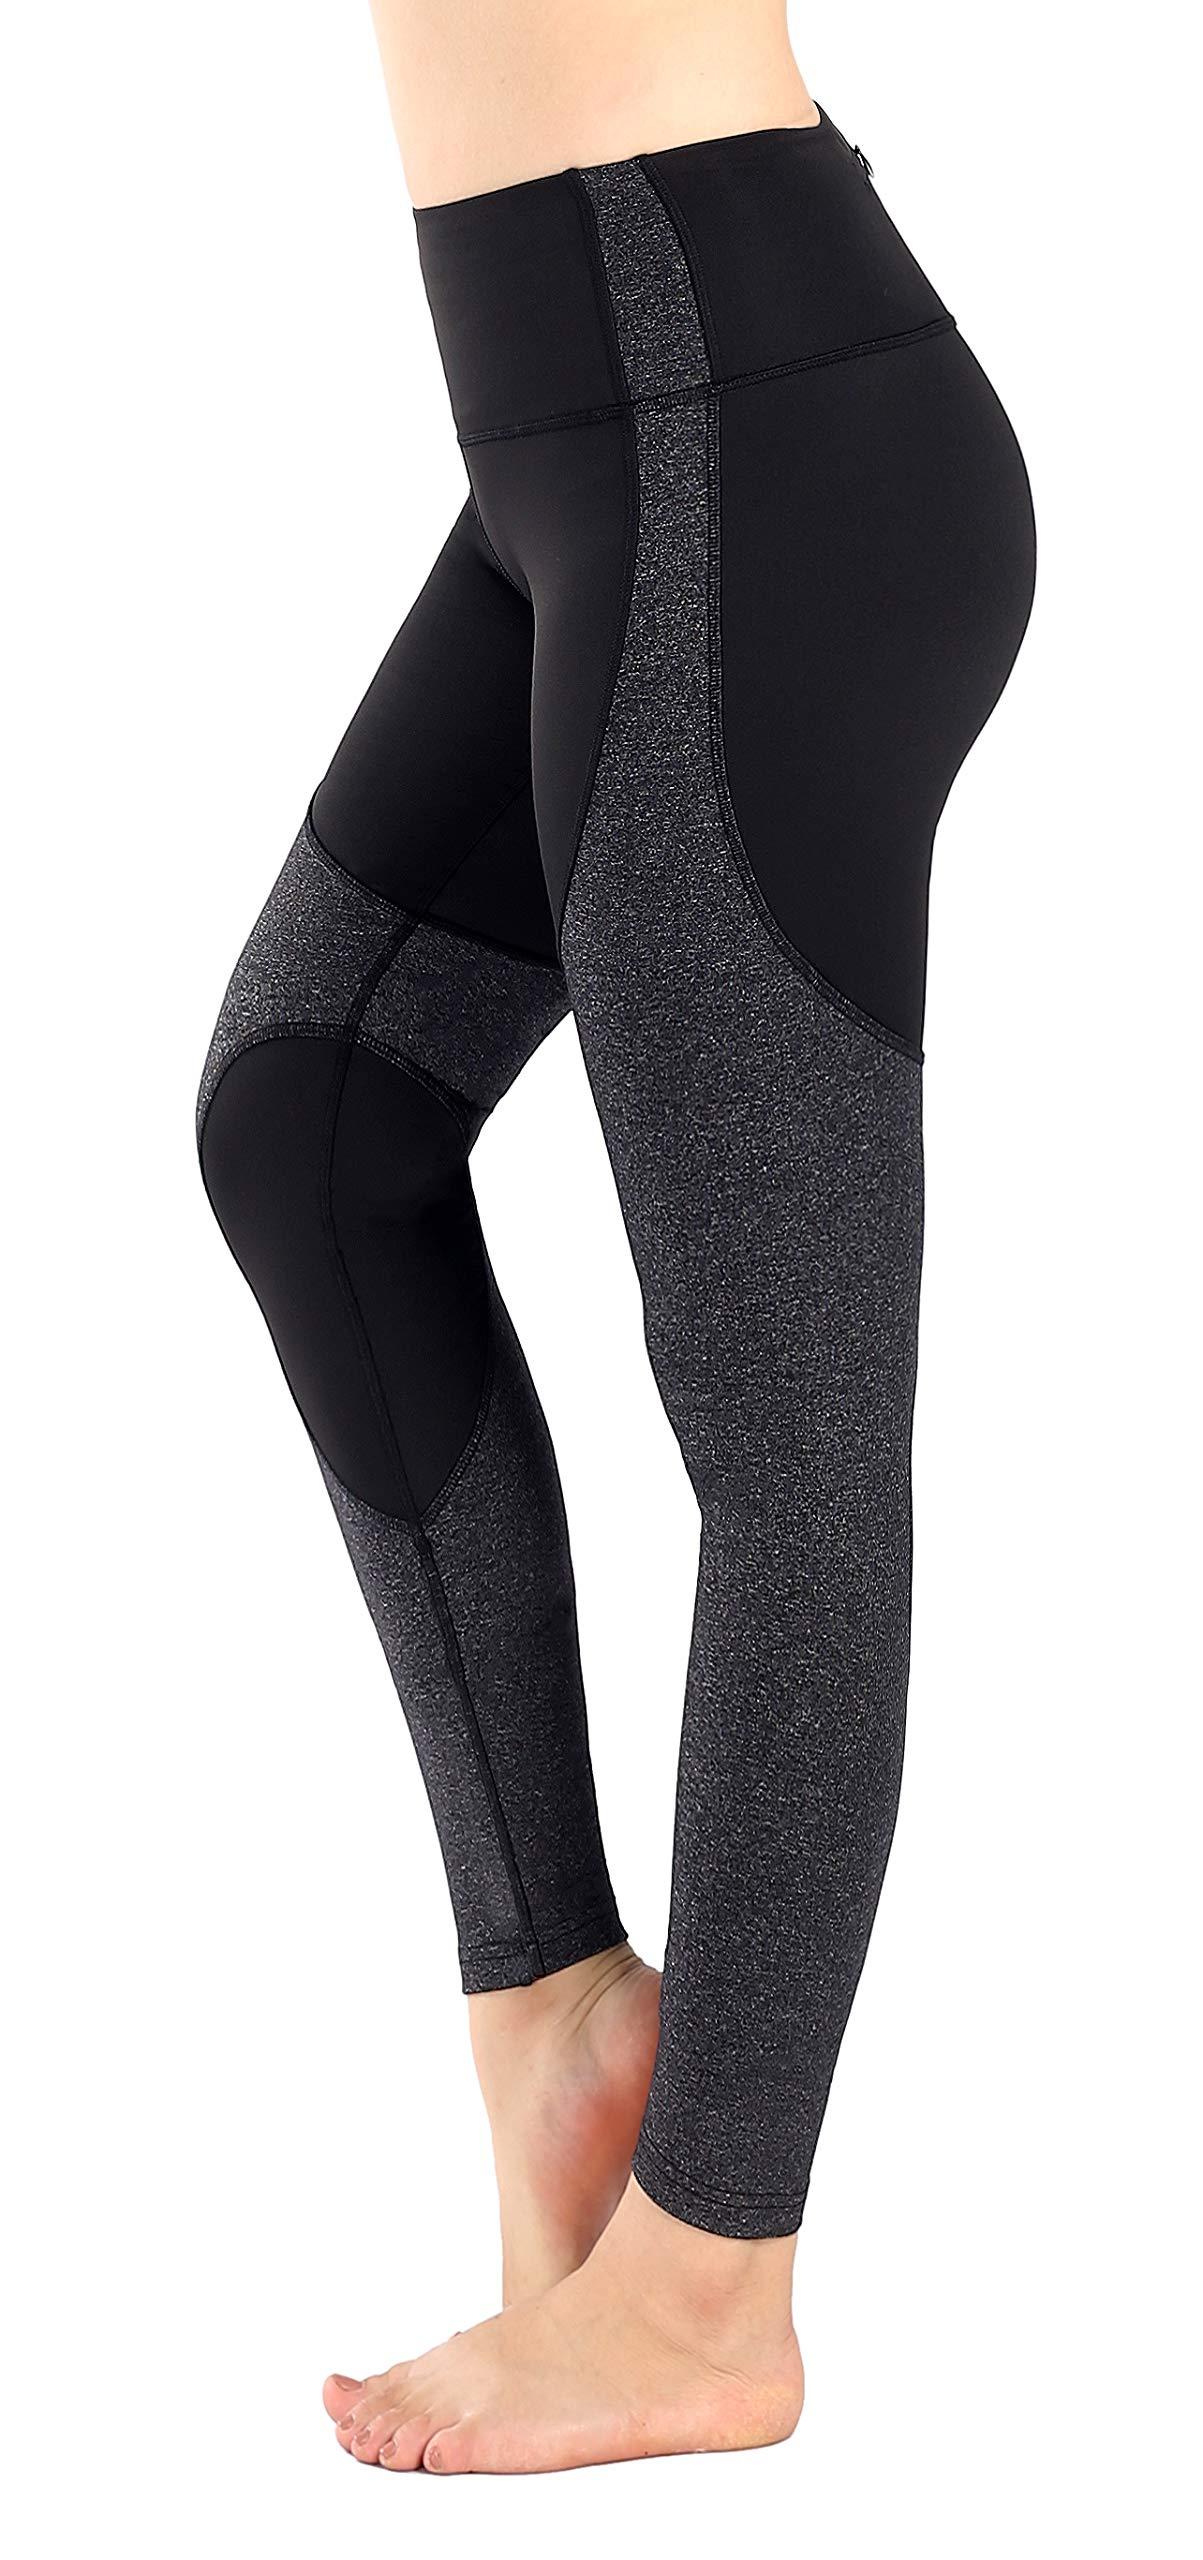 Munvot Women's Active Yoga Pants Workout Tights Running Yoga Leggings